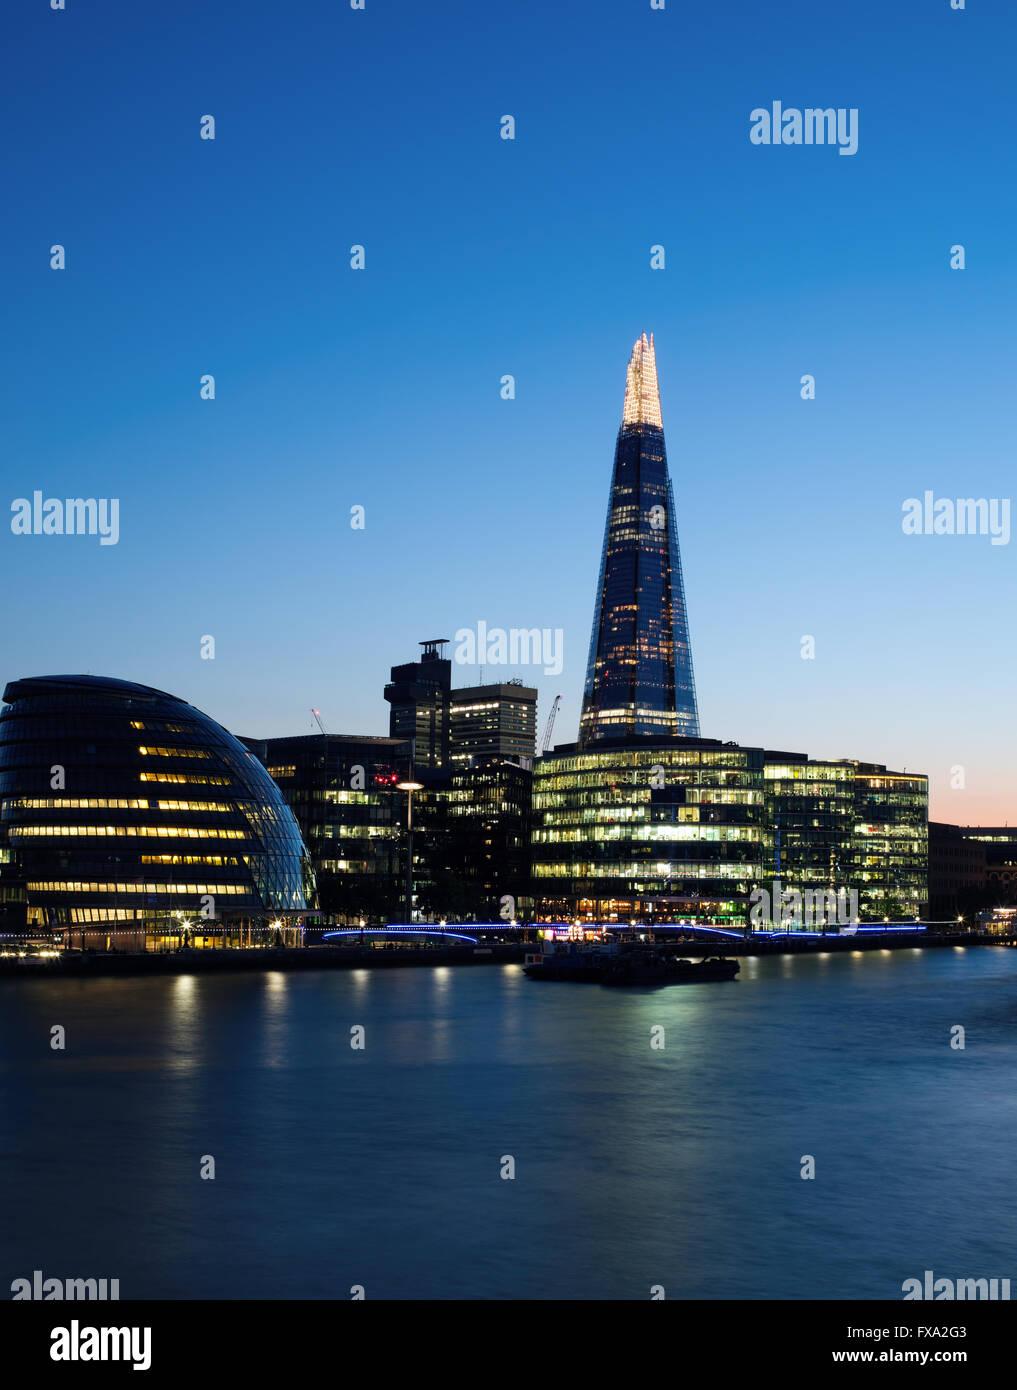 London blue hour sky over the Shard - Stock Image